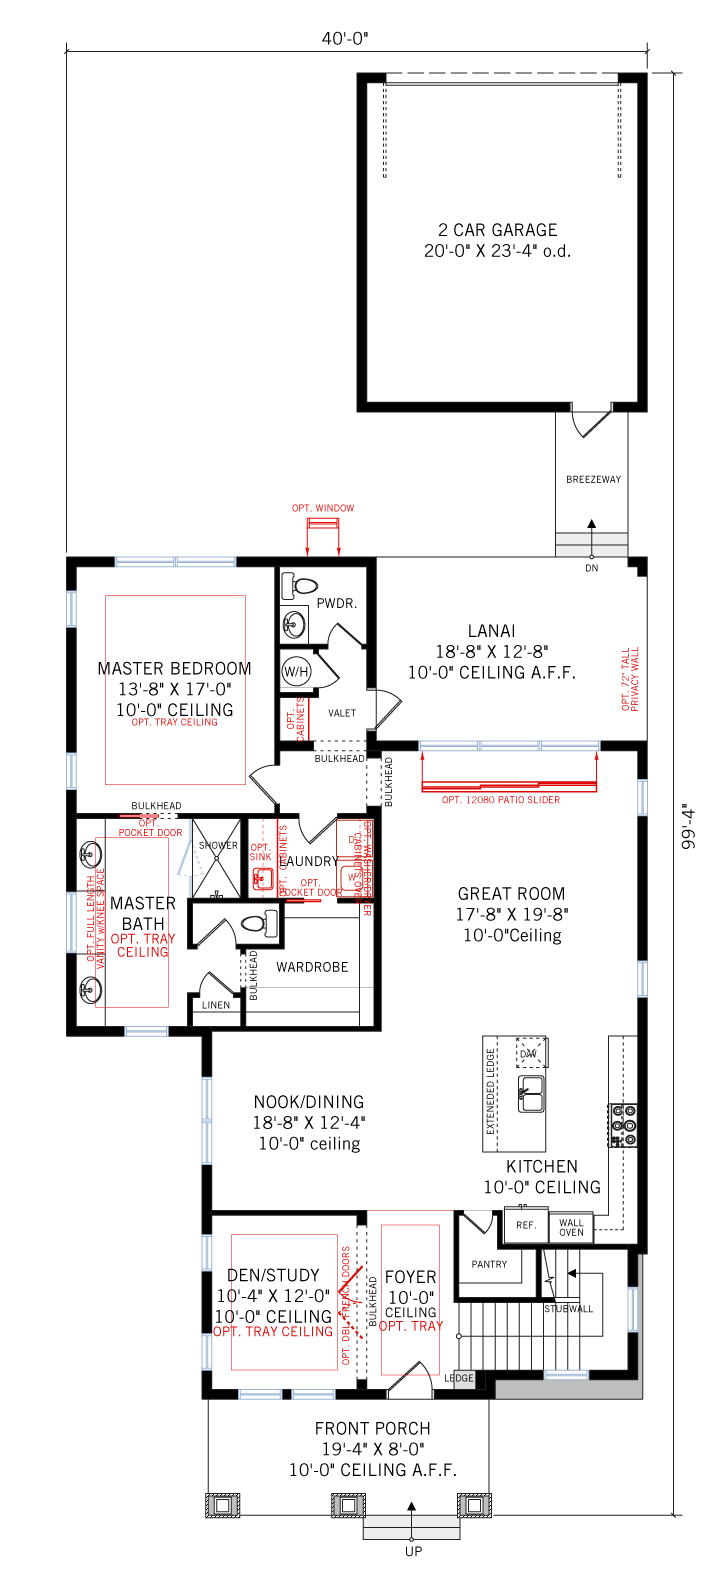 Base floorplan of Allure - Elev D - 2,771 sqft, 4-5 Bedroom, 3.5 Bathroom - Cardel Homes Tampa